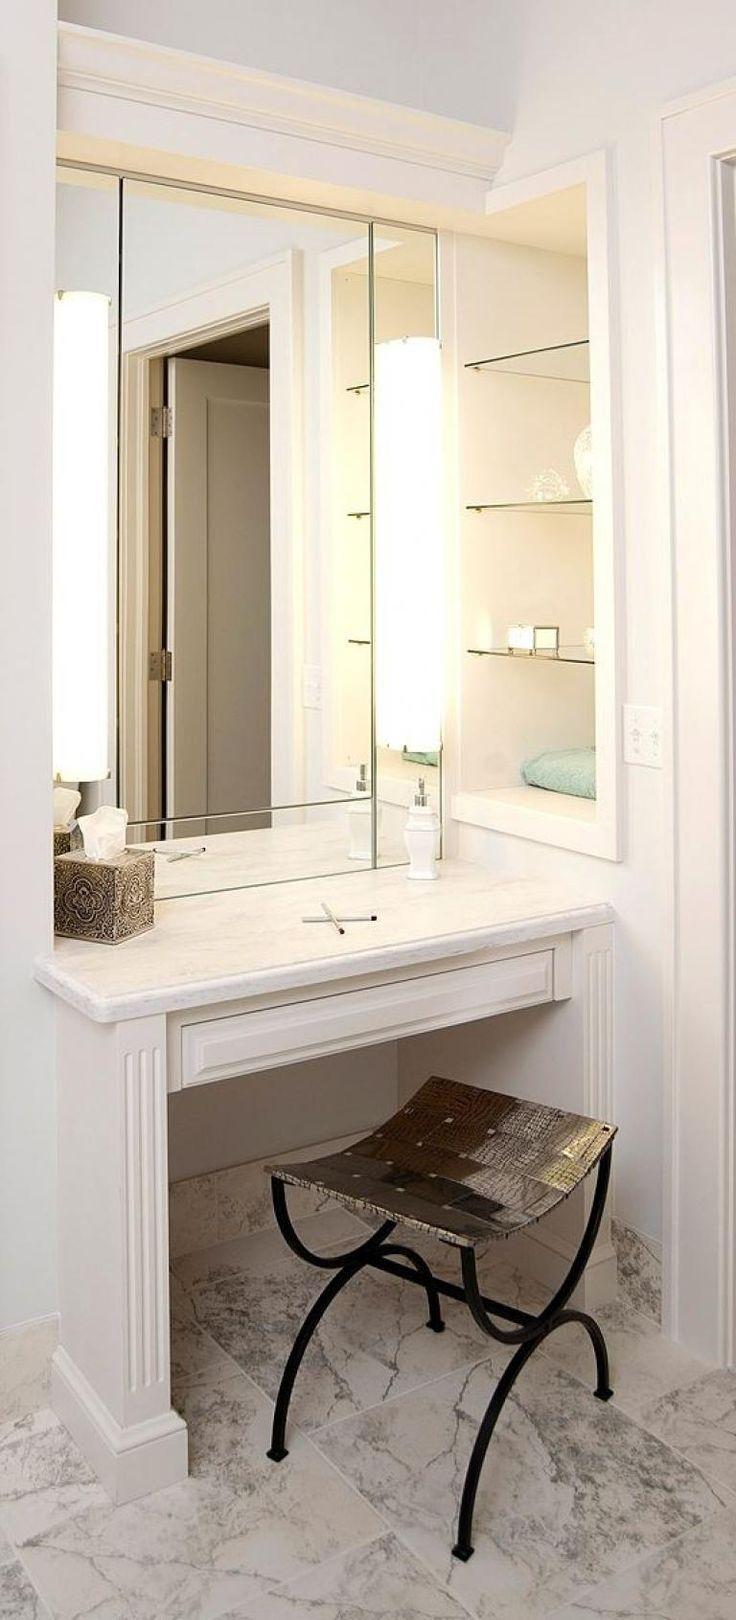 Hottest Photographs Bathroom Vanity Seat Popular In 2020